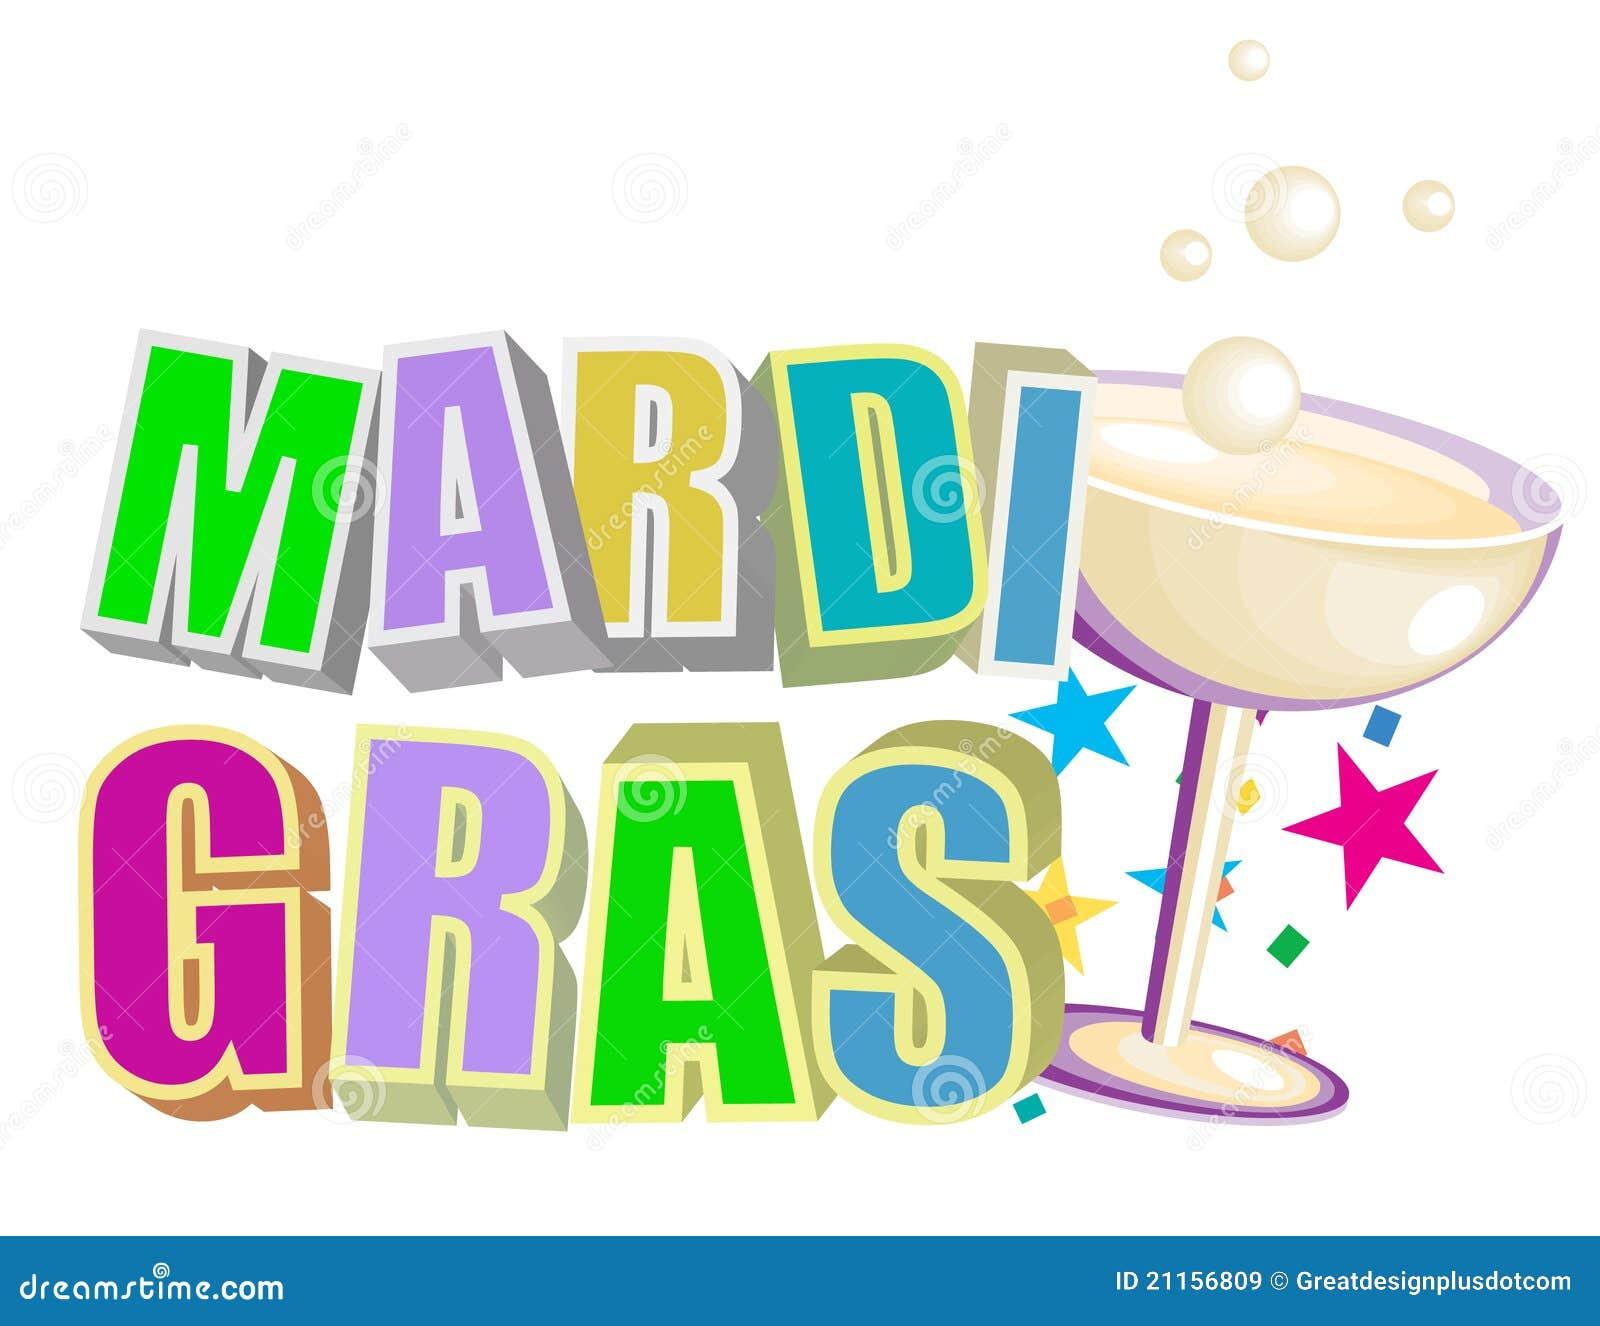 Mardi Gras Clip Art! Royalty Free Stock Images - Image: 21156809